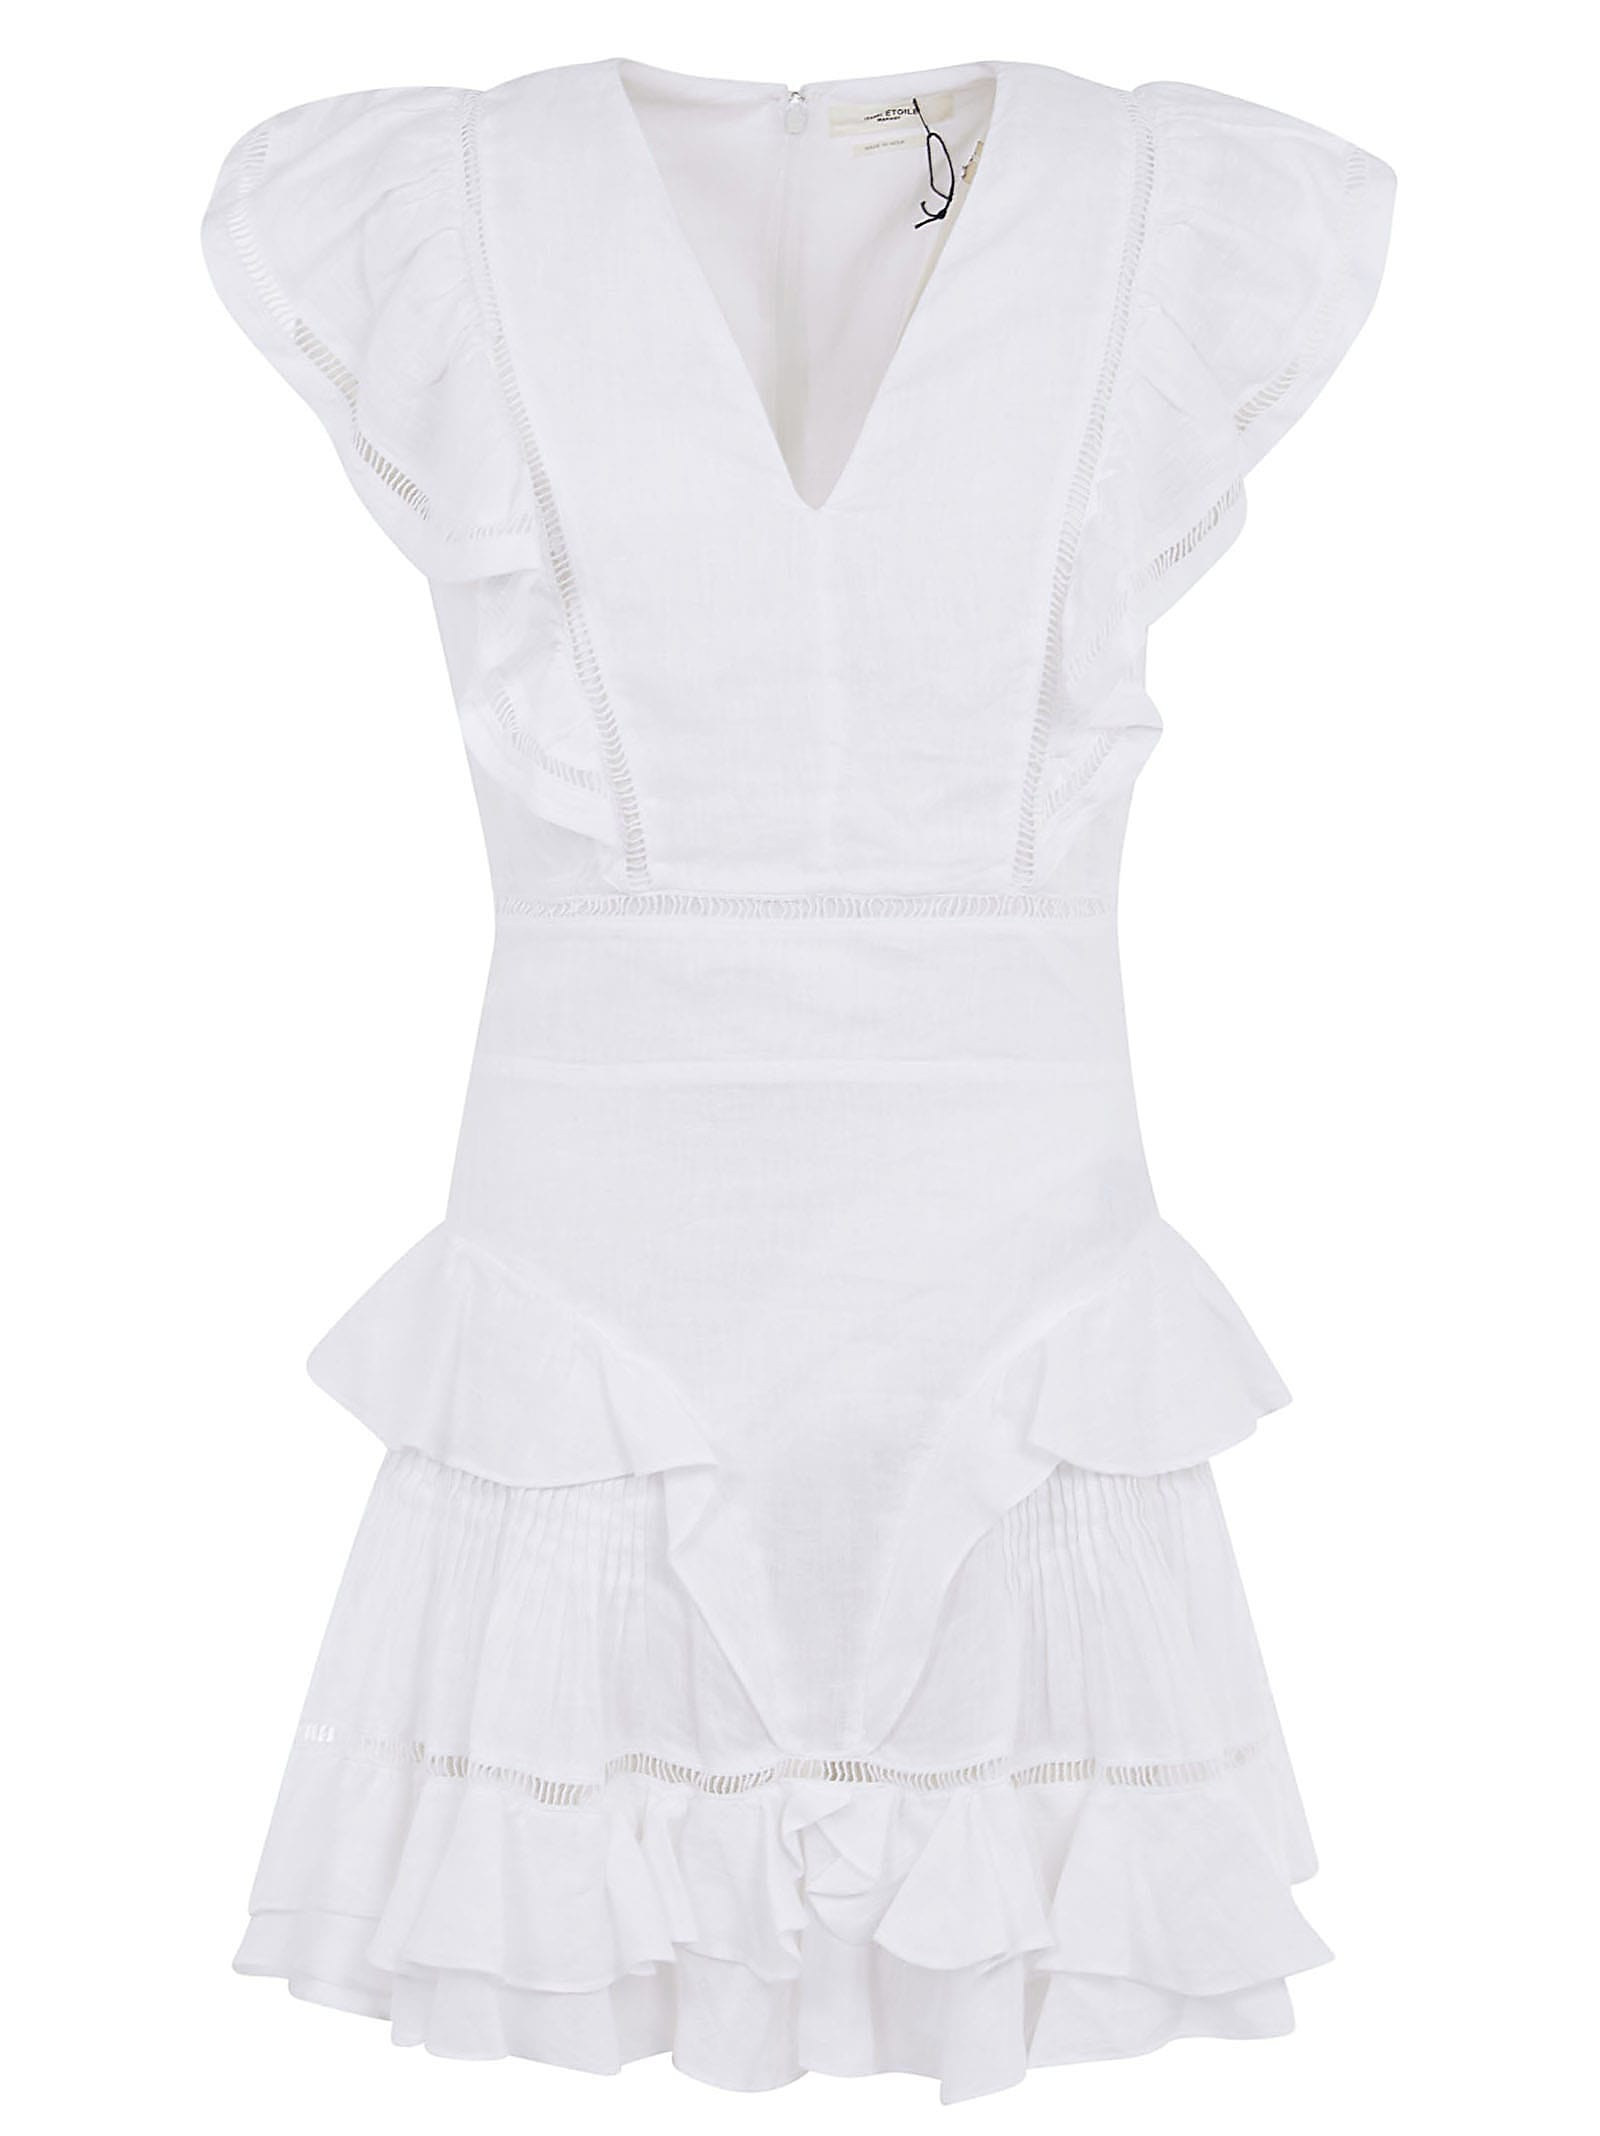 Buy Isabel Marant Étoile V-neck Ruffled Skirt Dress online, shop Isabel Marant Étoile with free shipping